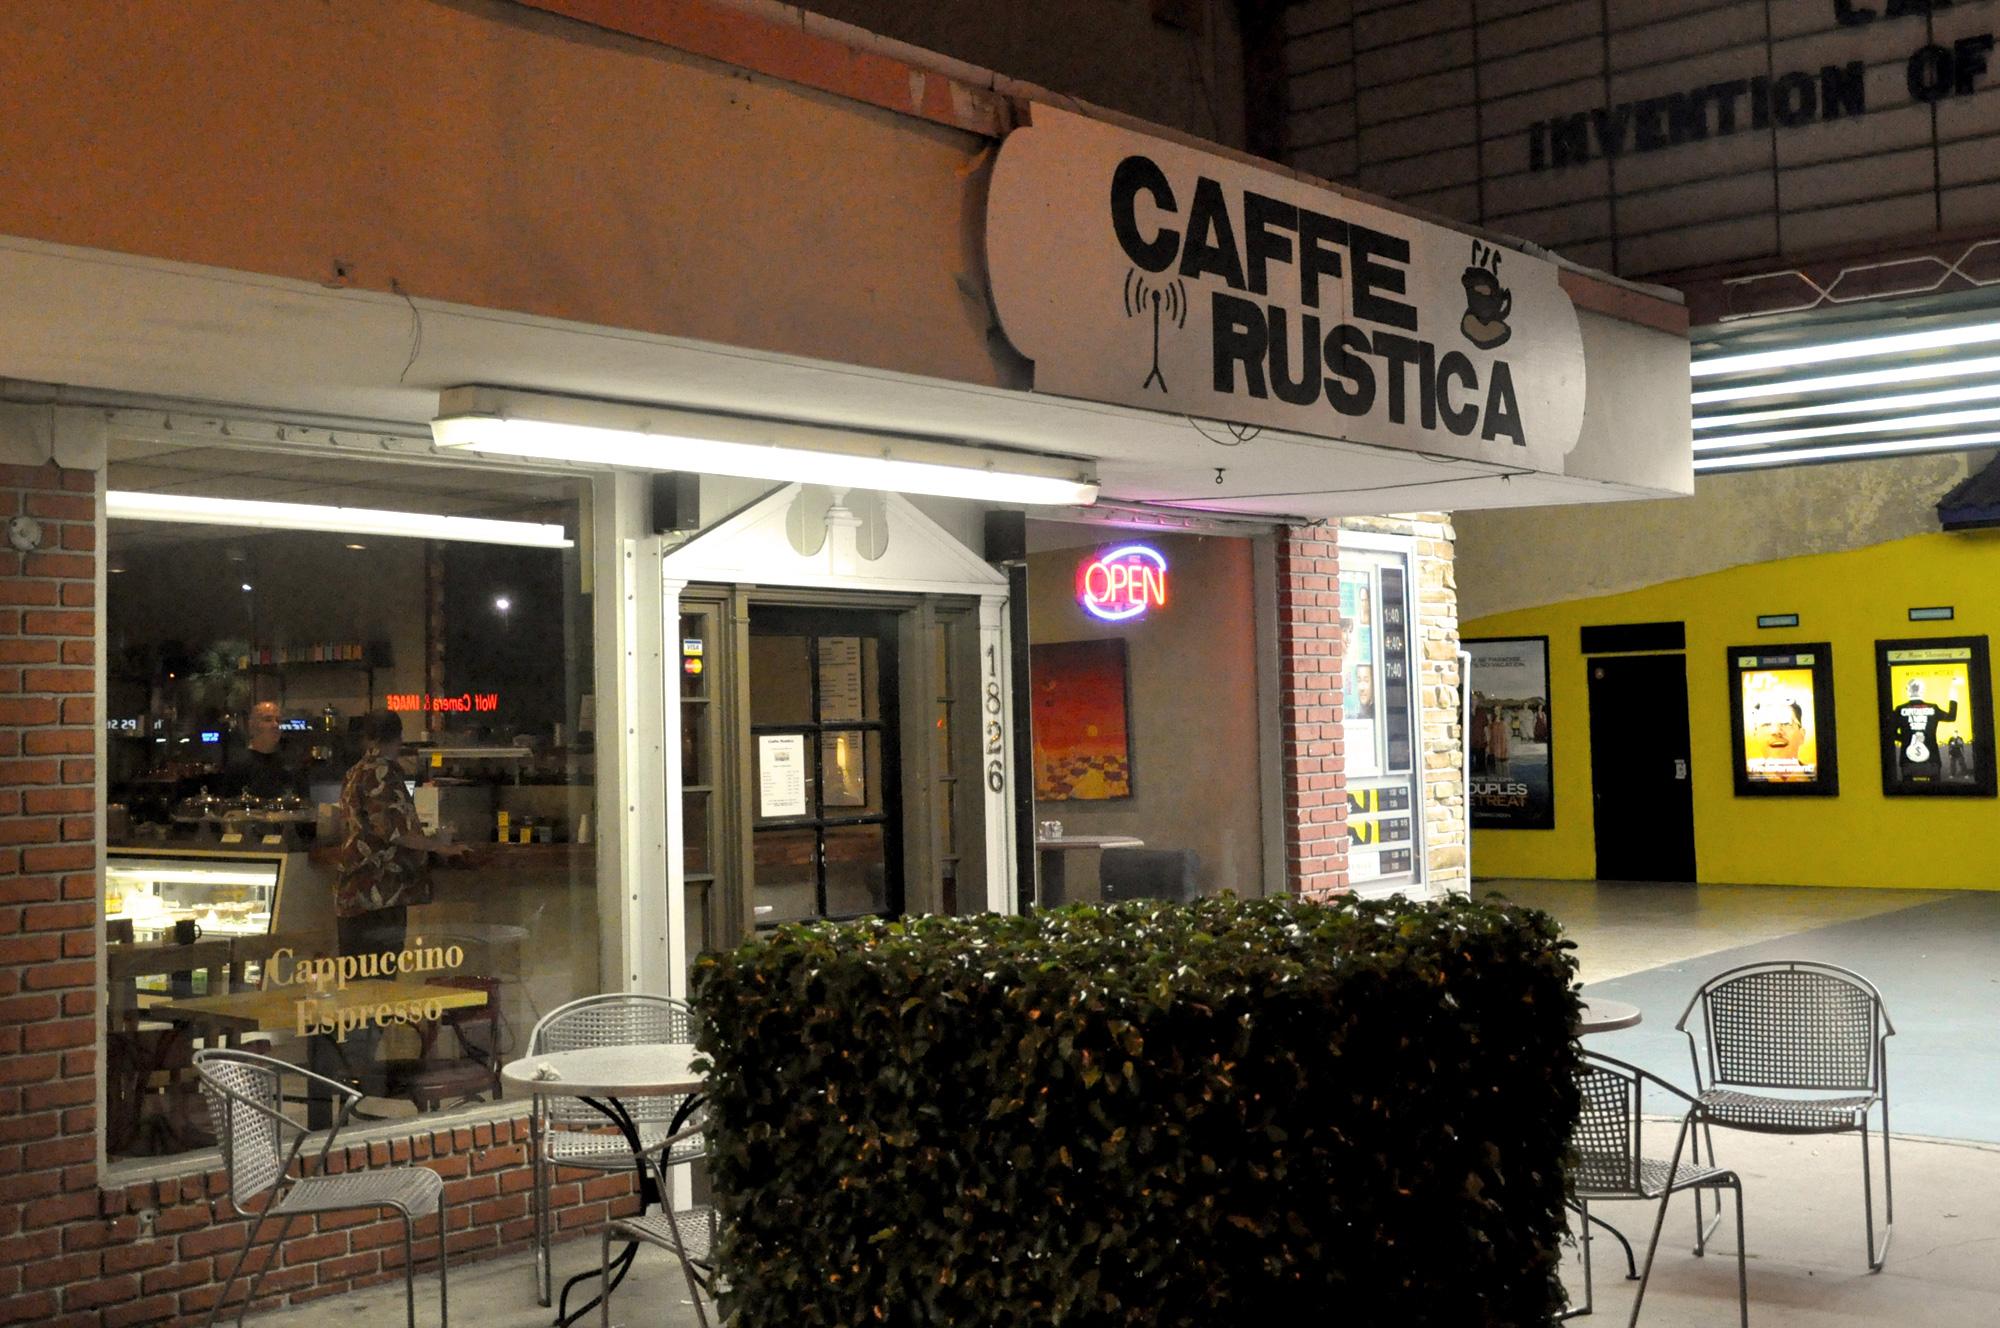 Caffe_Rustica